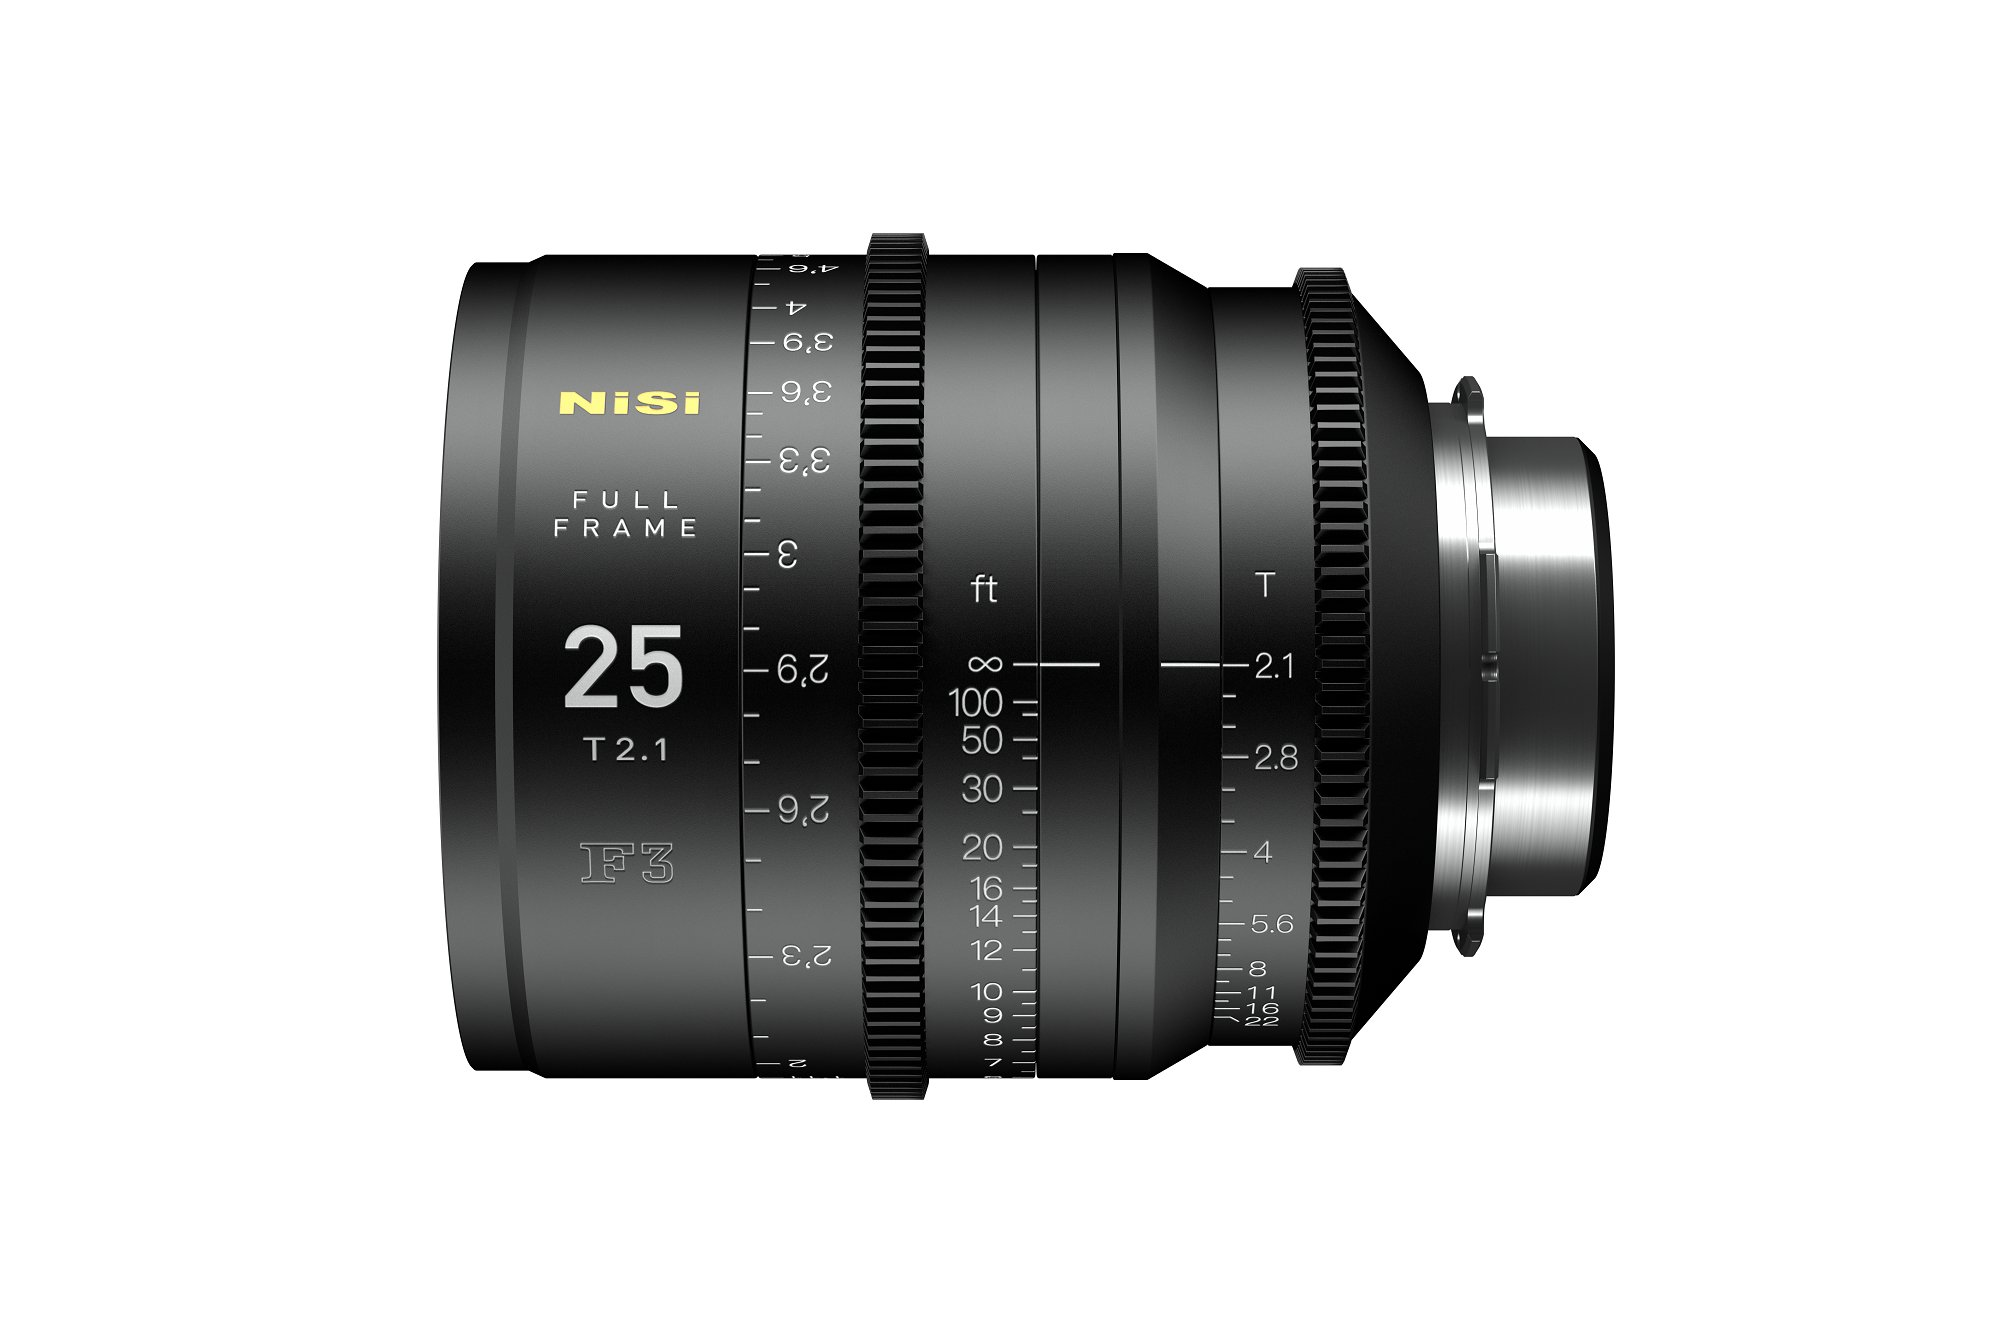 Nisi F3 25mm Full Frame lens T2.1 | MTF Services